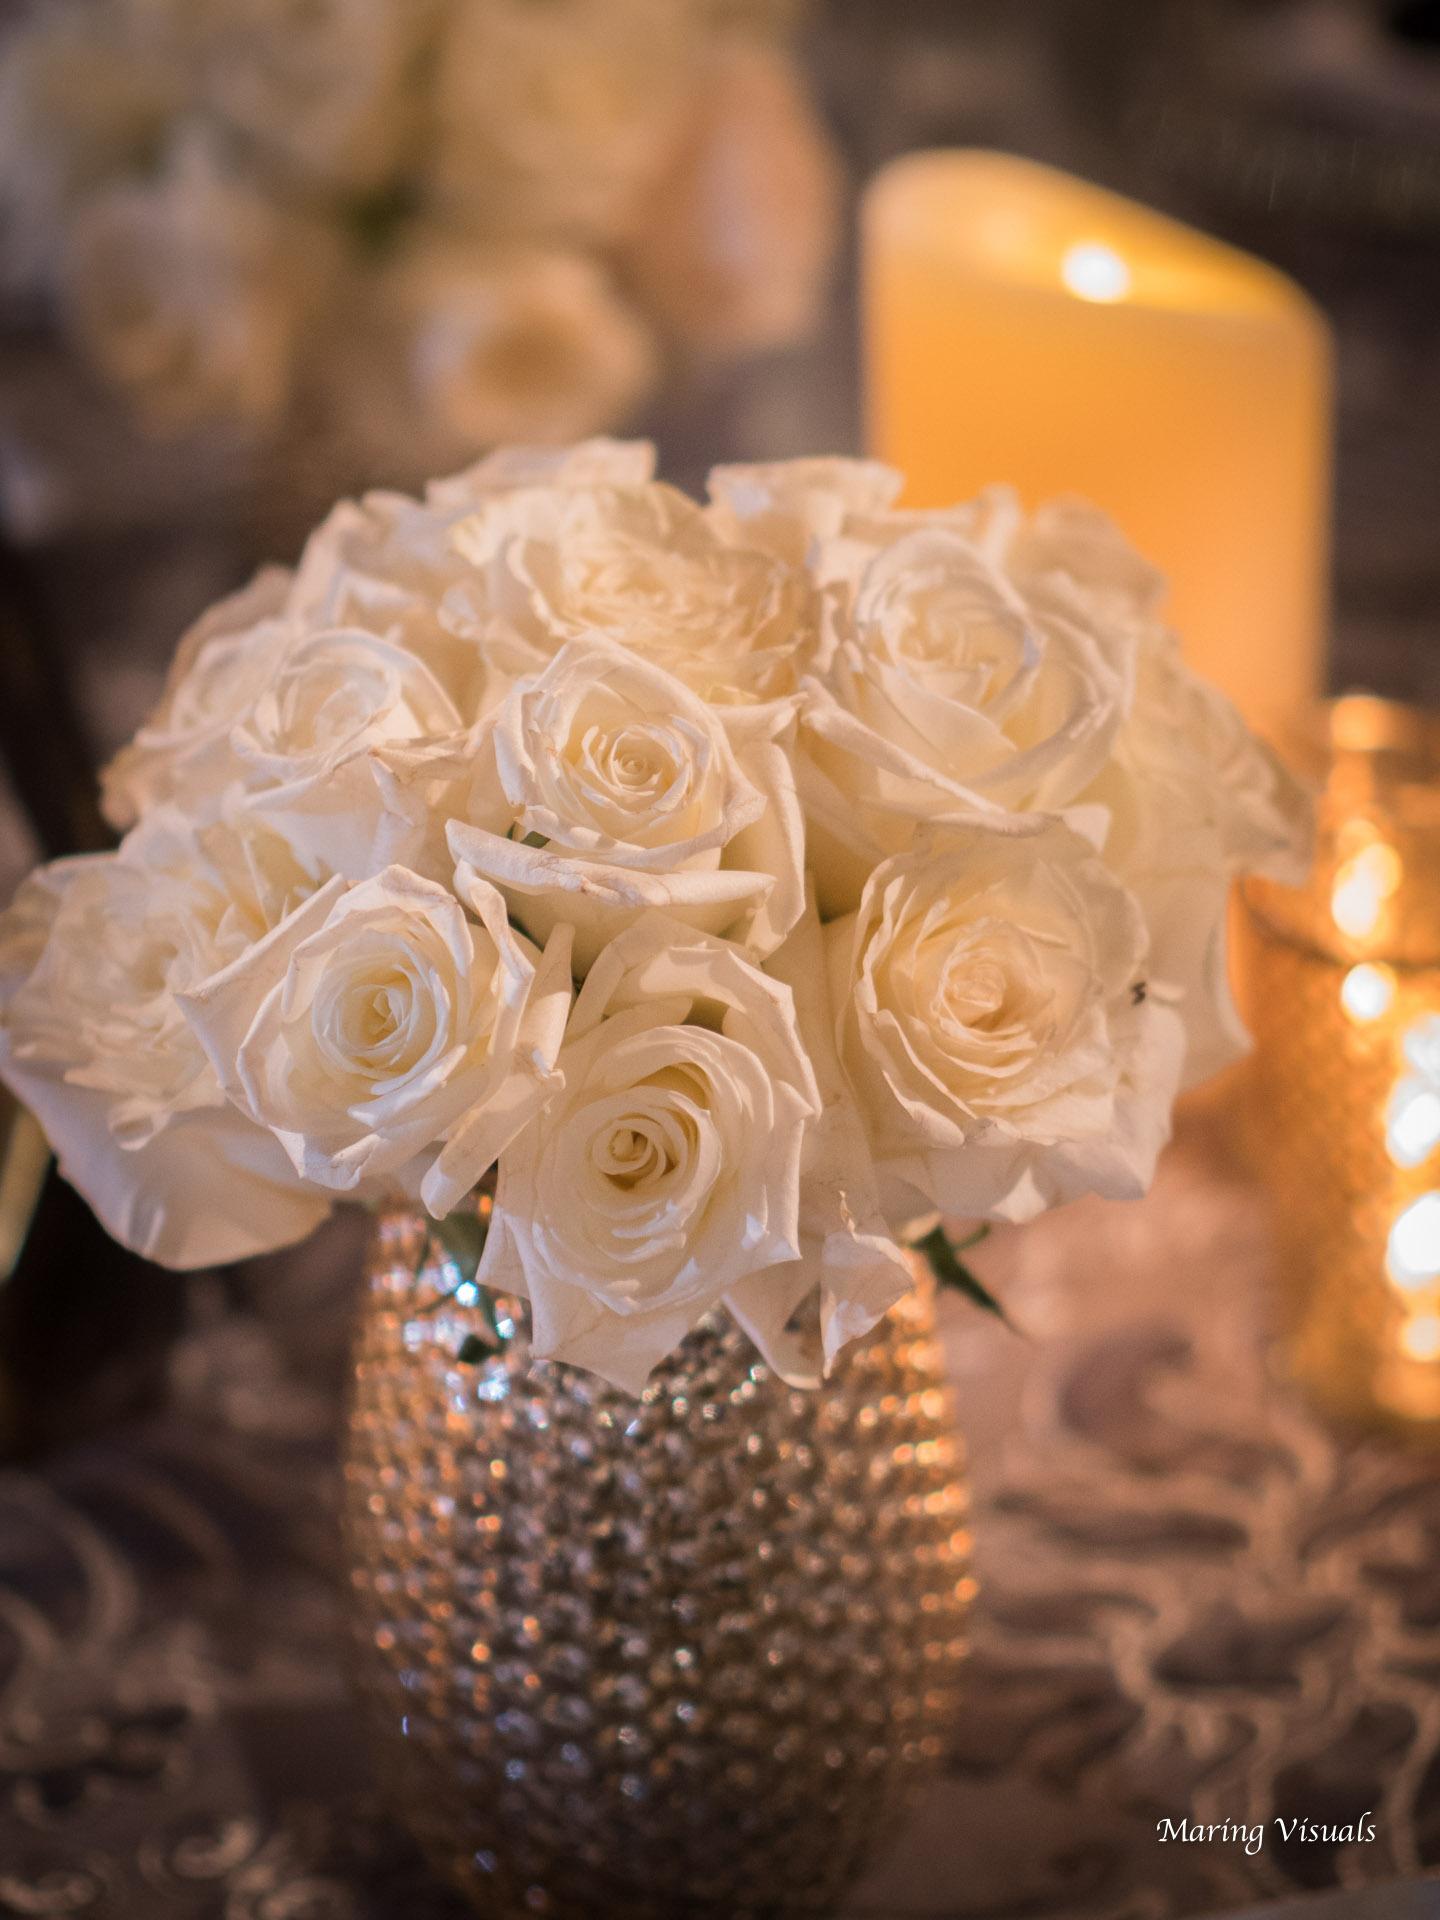 David Tutera Weddings by Maring Visuals 00550.jpg